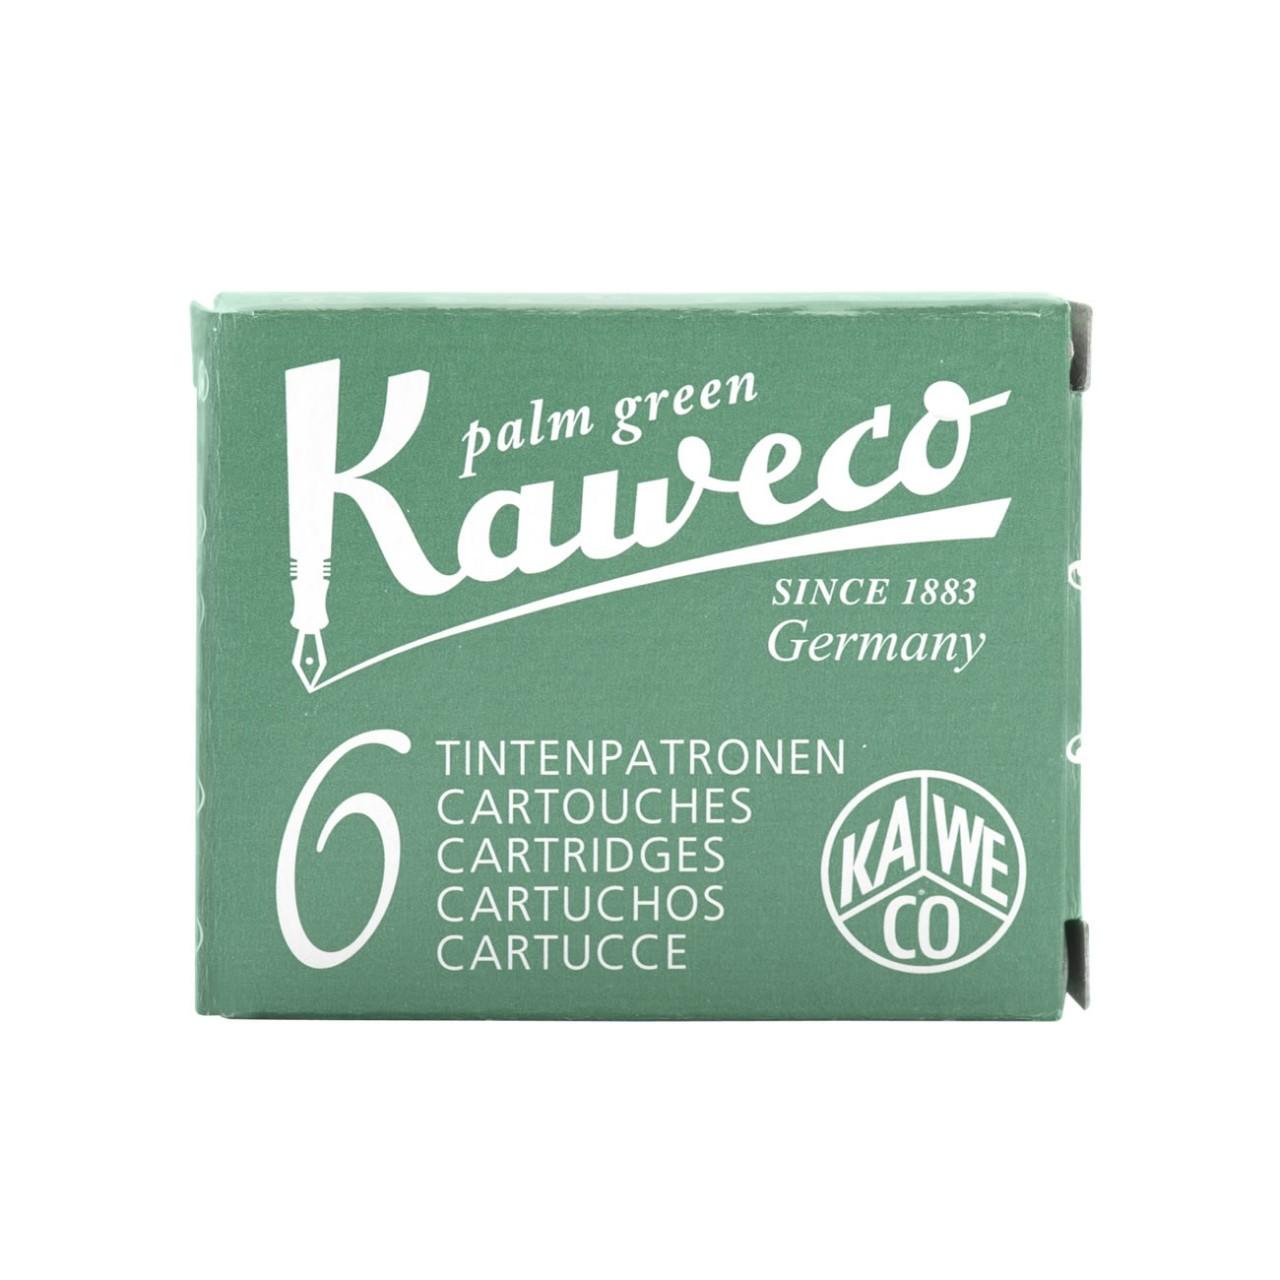 Kaweco Tintenpatronen 6 Stück palmengrün VE=20 Pack